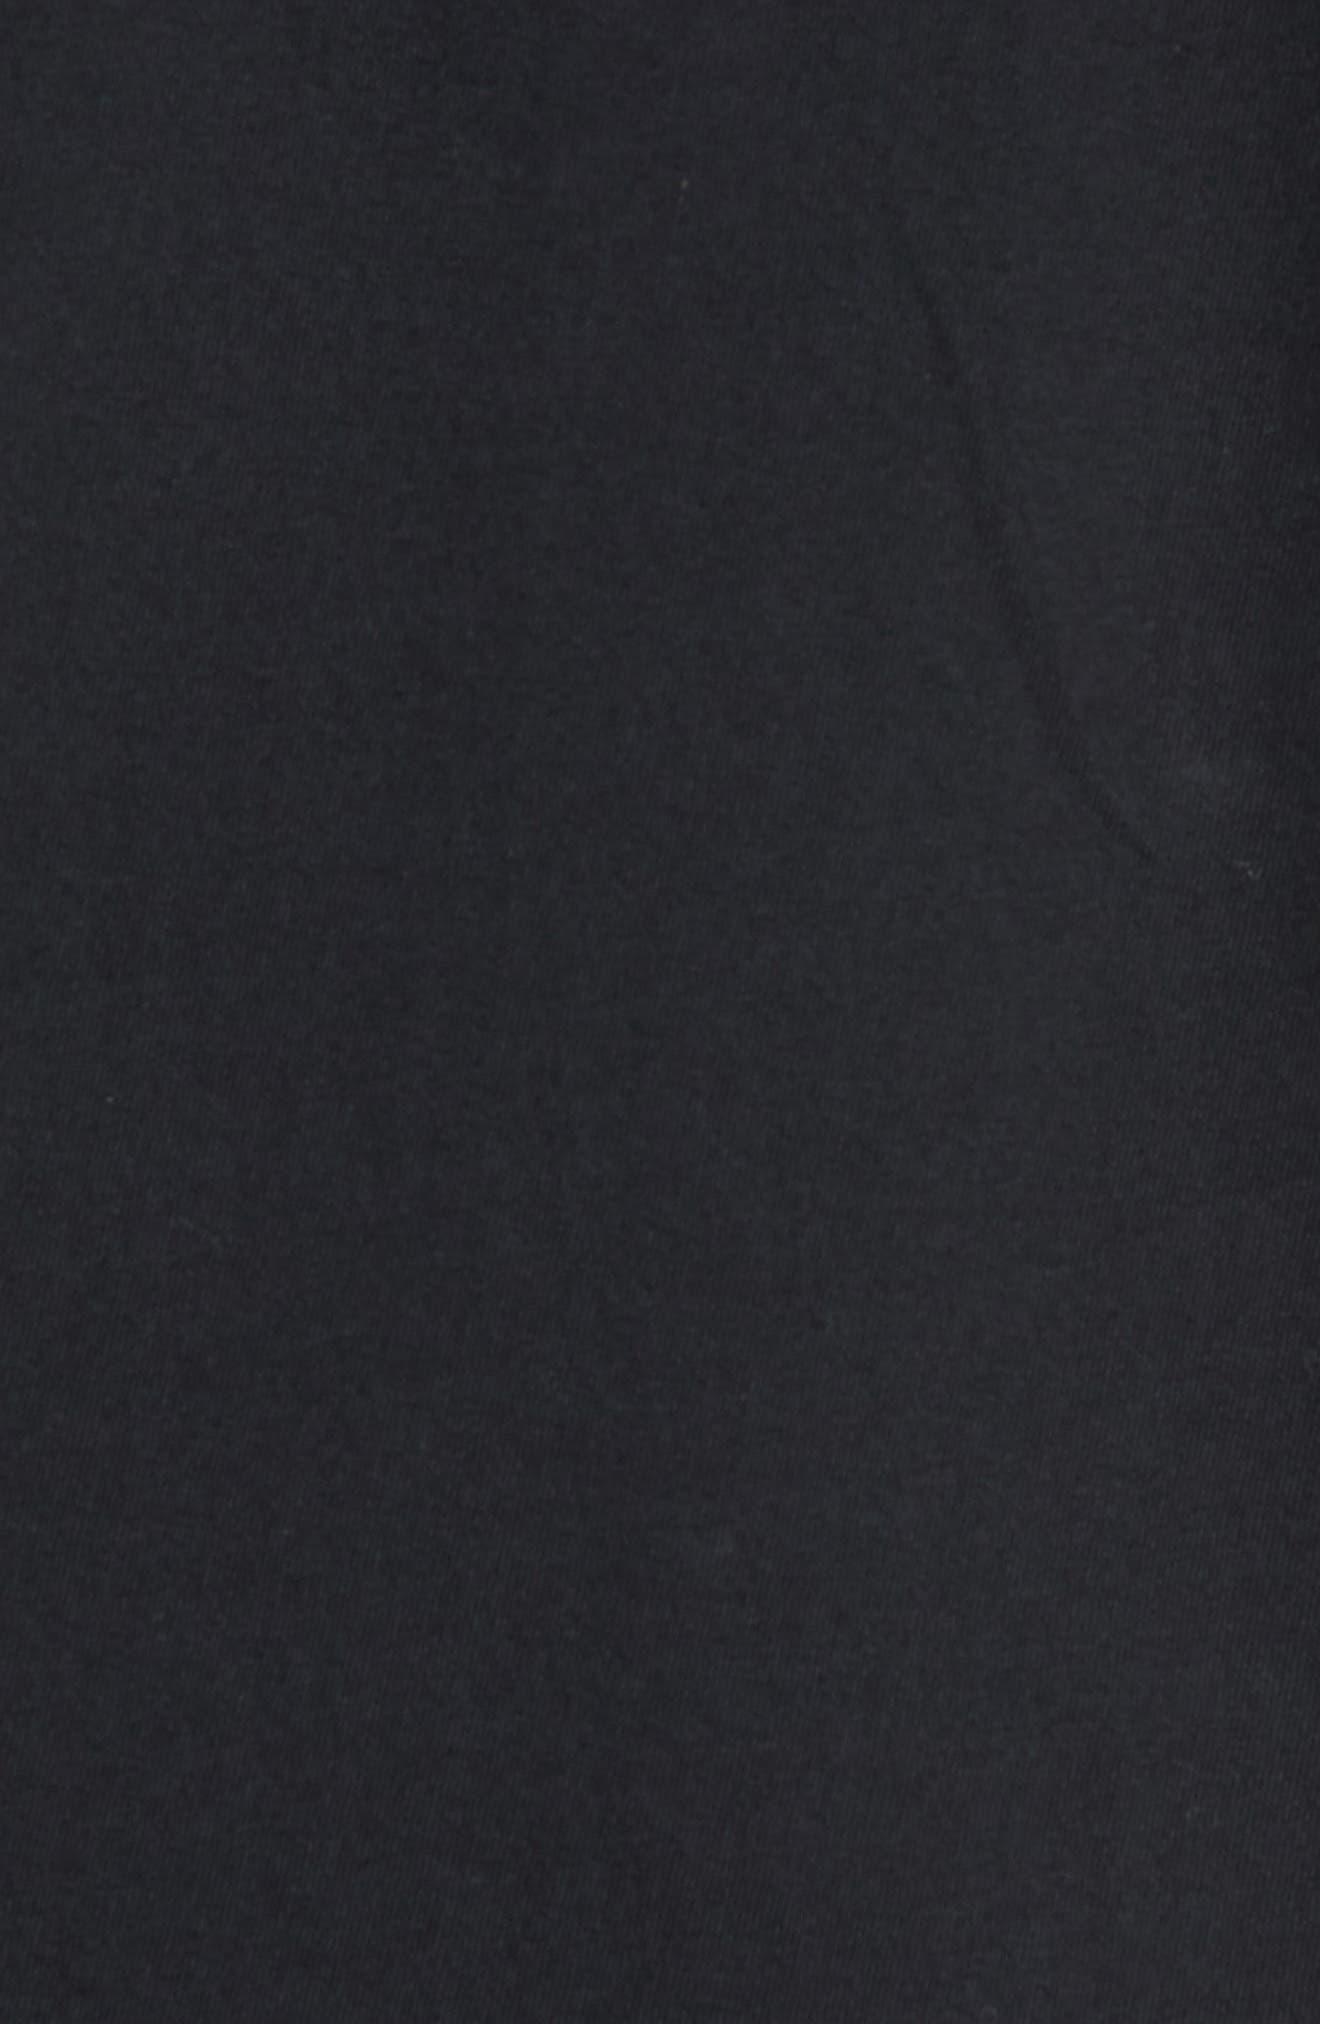 I'm Lucky Graphic T-Shirt,                             Alternate thumbnail 5, color,                             Black Tee Leprechaun